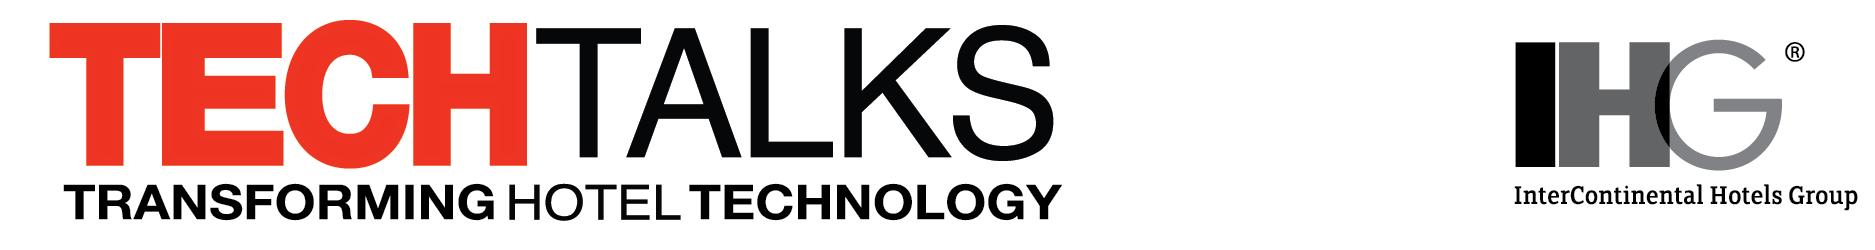 Americas TechTalks